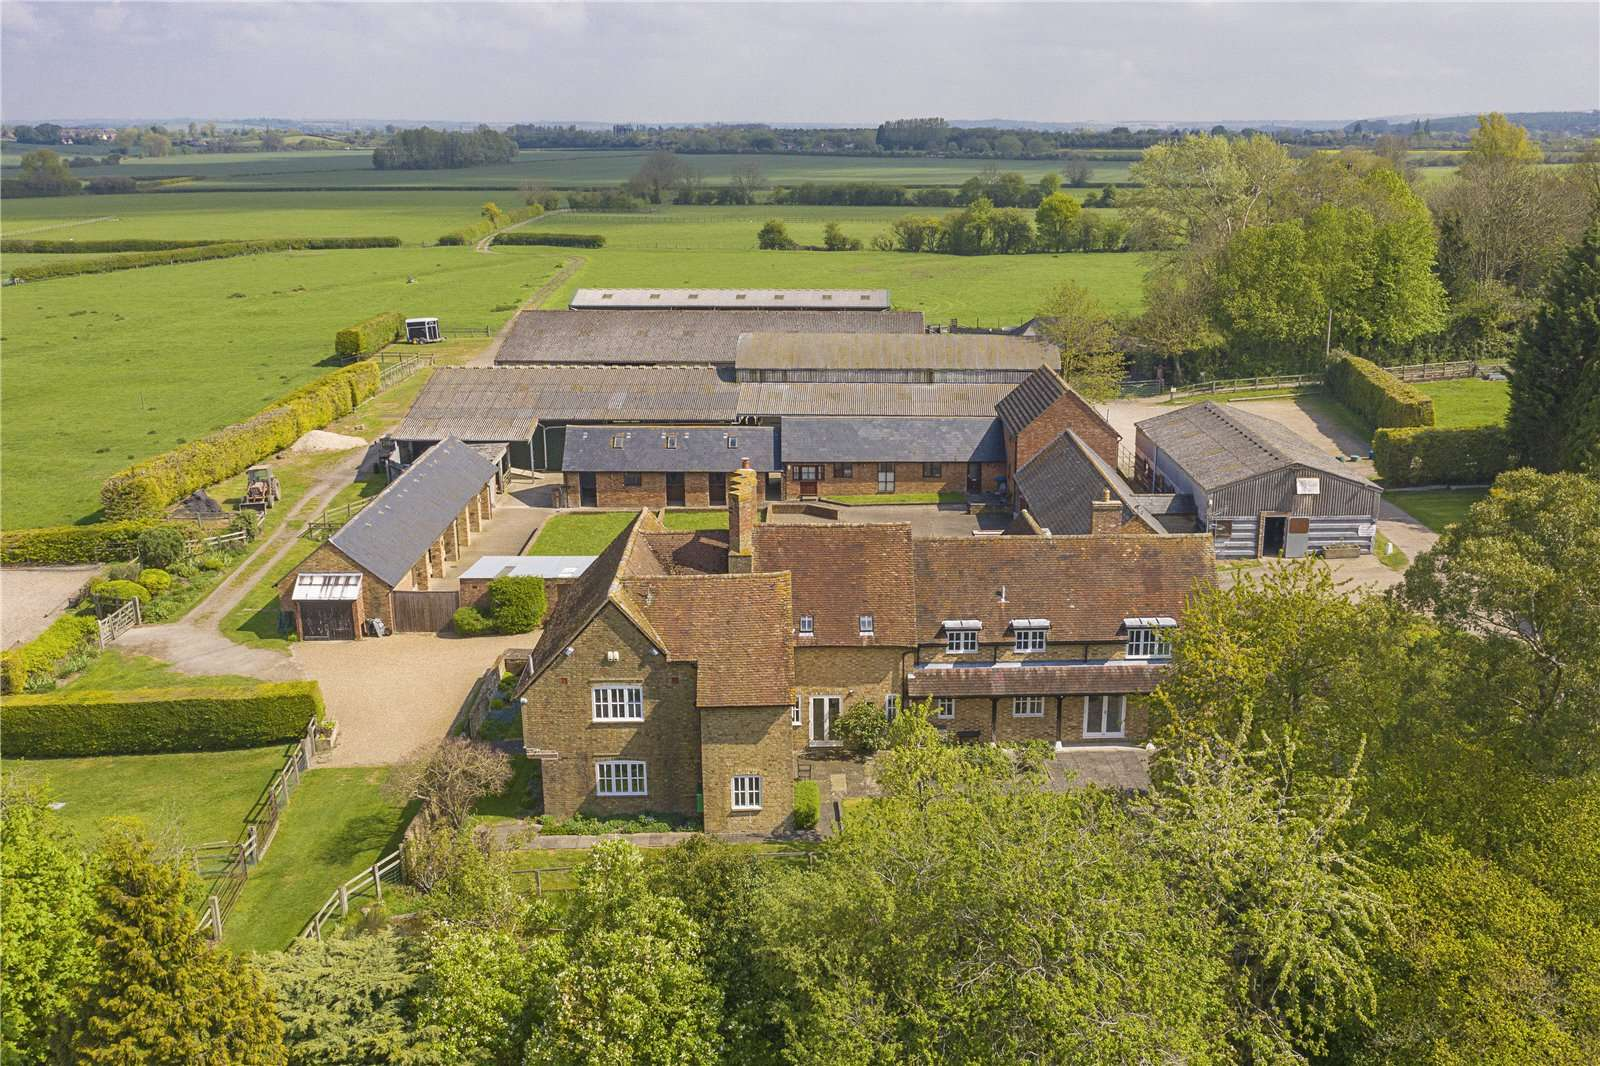 Savills | Manor Farm, Marsworth, Tring, Hertfordshire, HP23 4NA |  Properties for sale